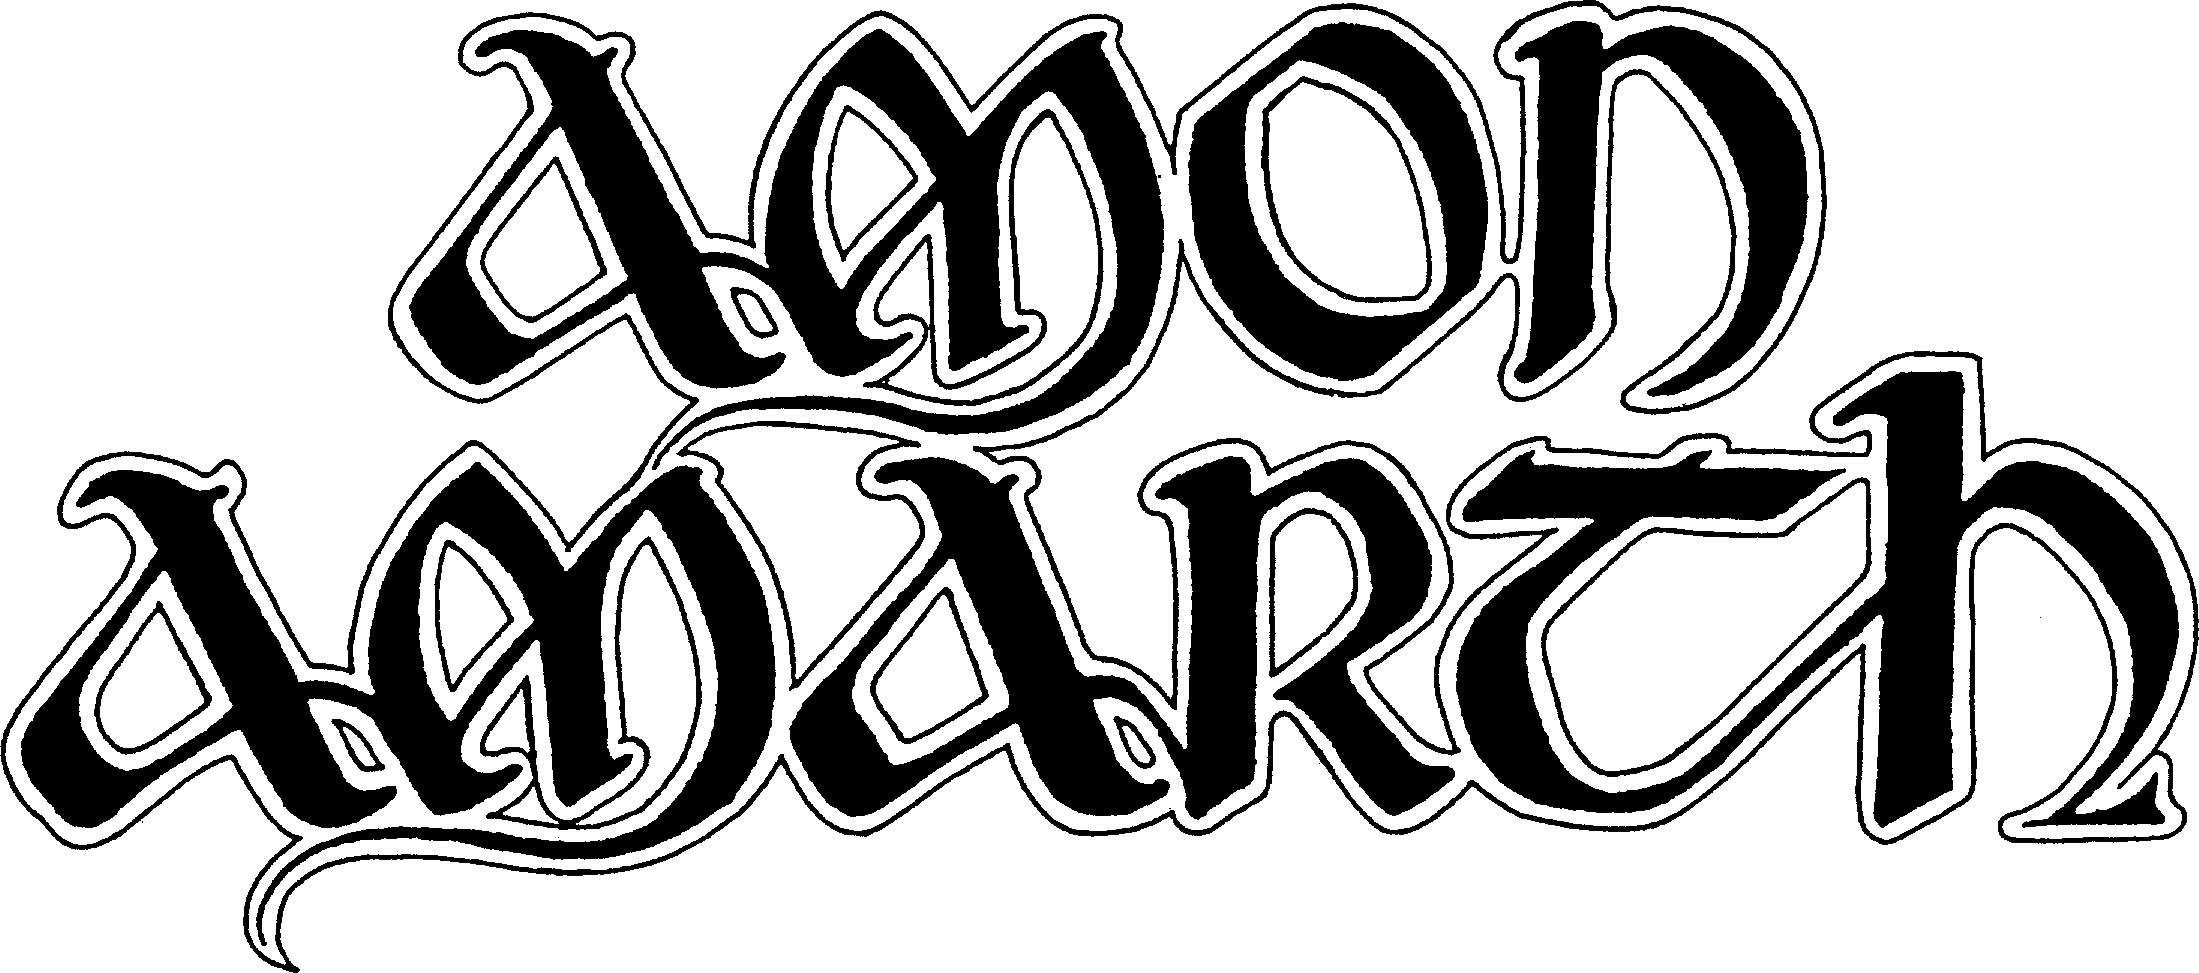 Amon Amarth Mens Logo